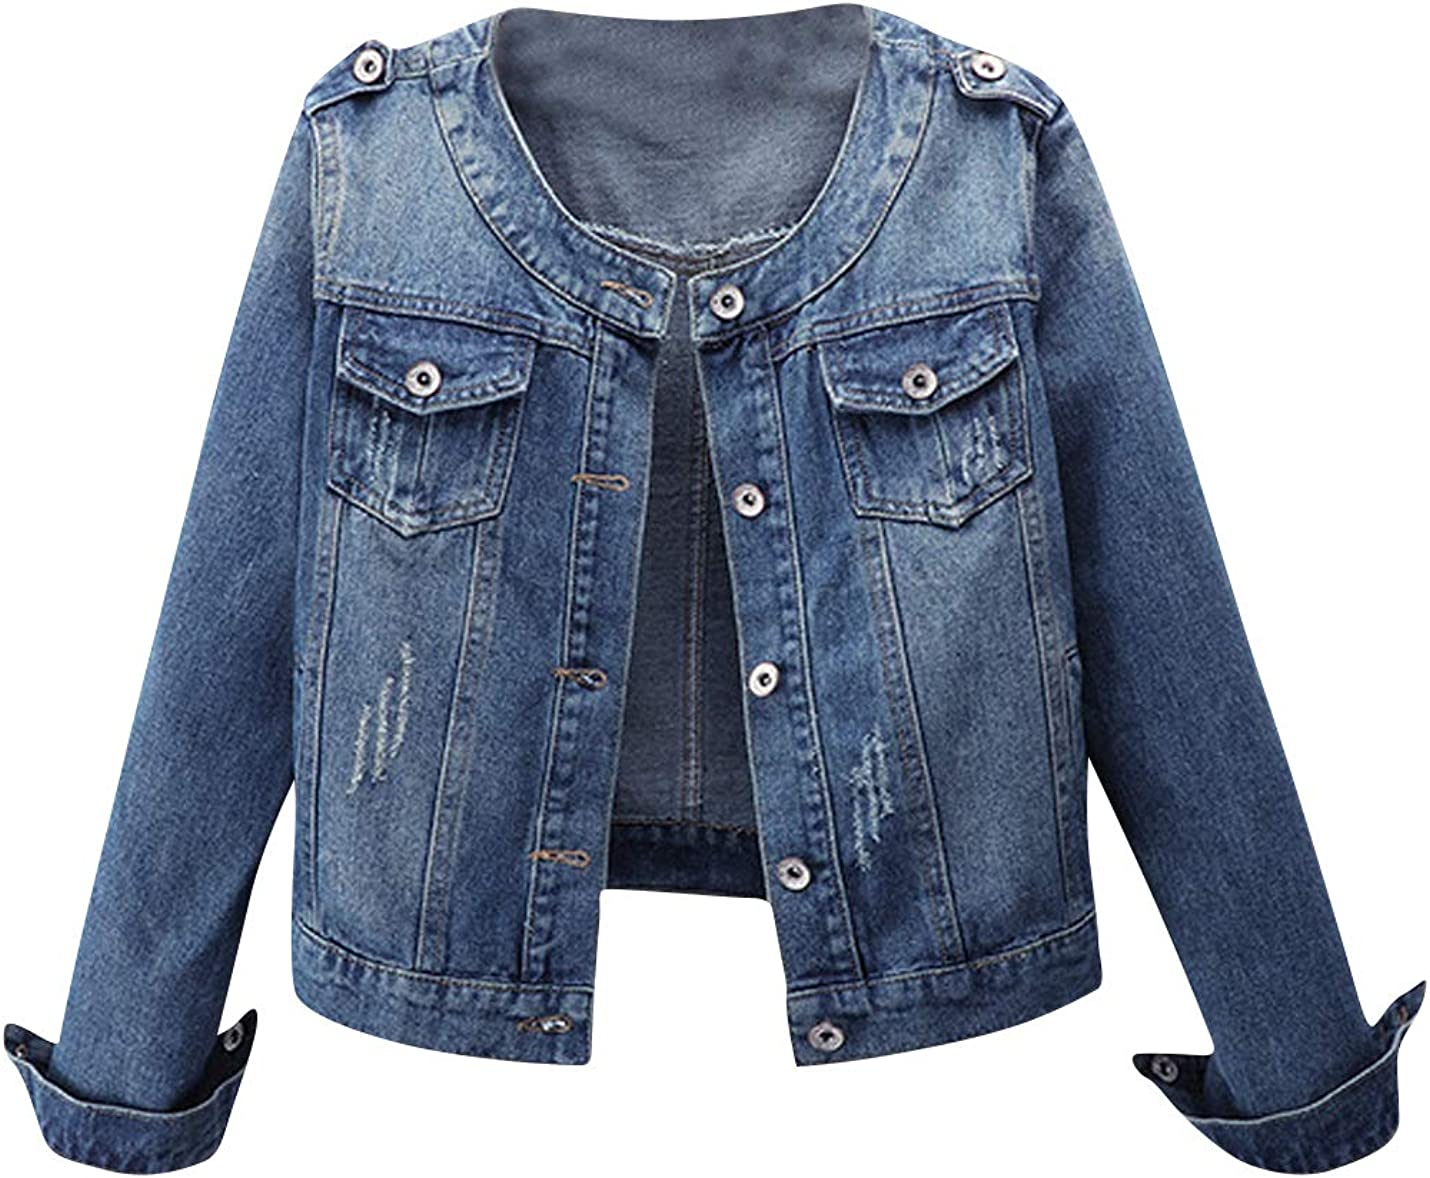 ZGZZ7 Women's Casual Vintage Denim Jackets Buttons Frayed Outerwear Jean Trucker Jacket Coats